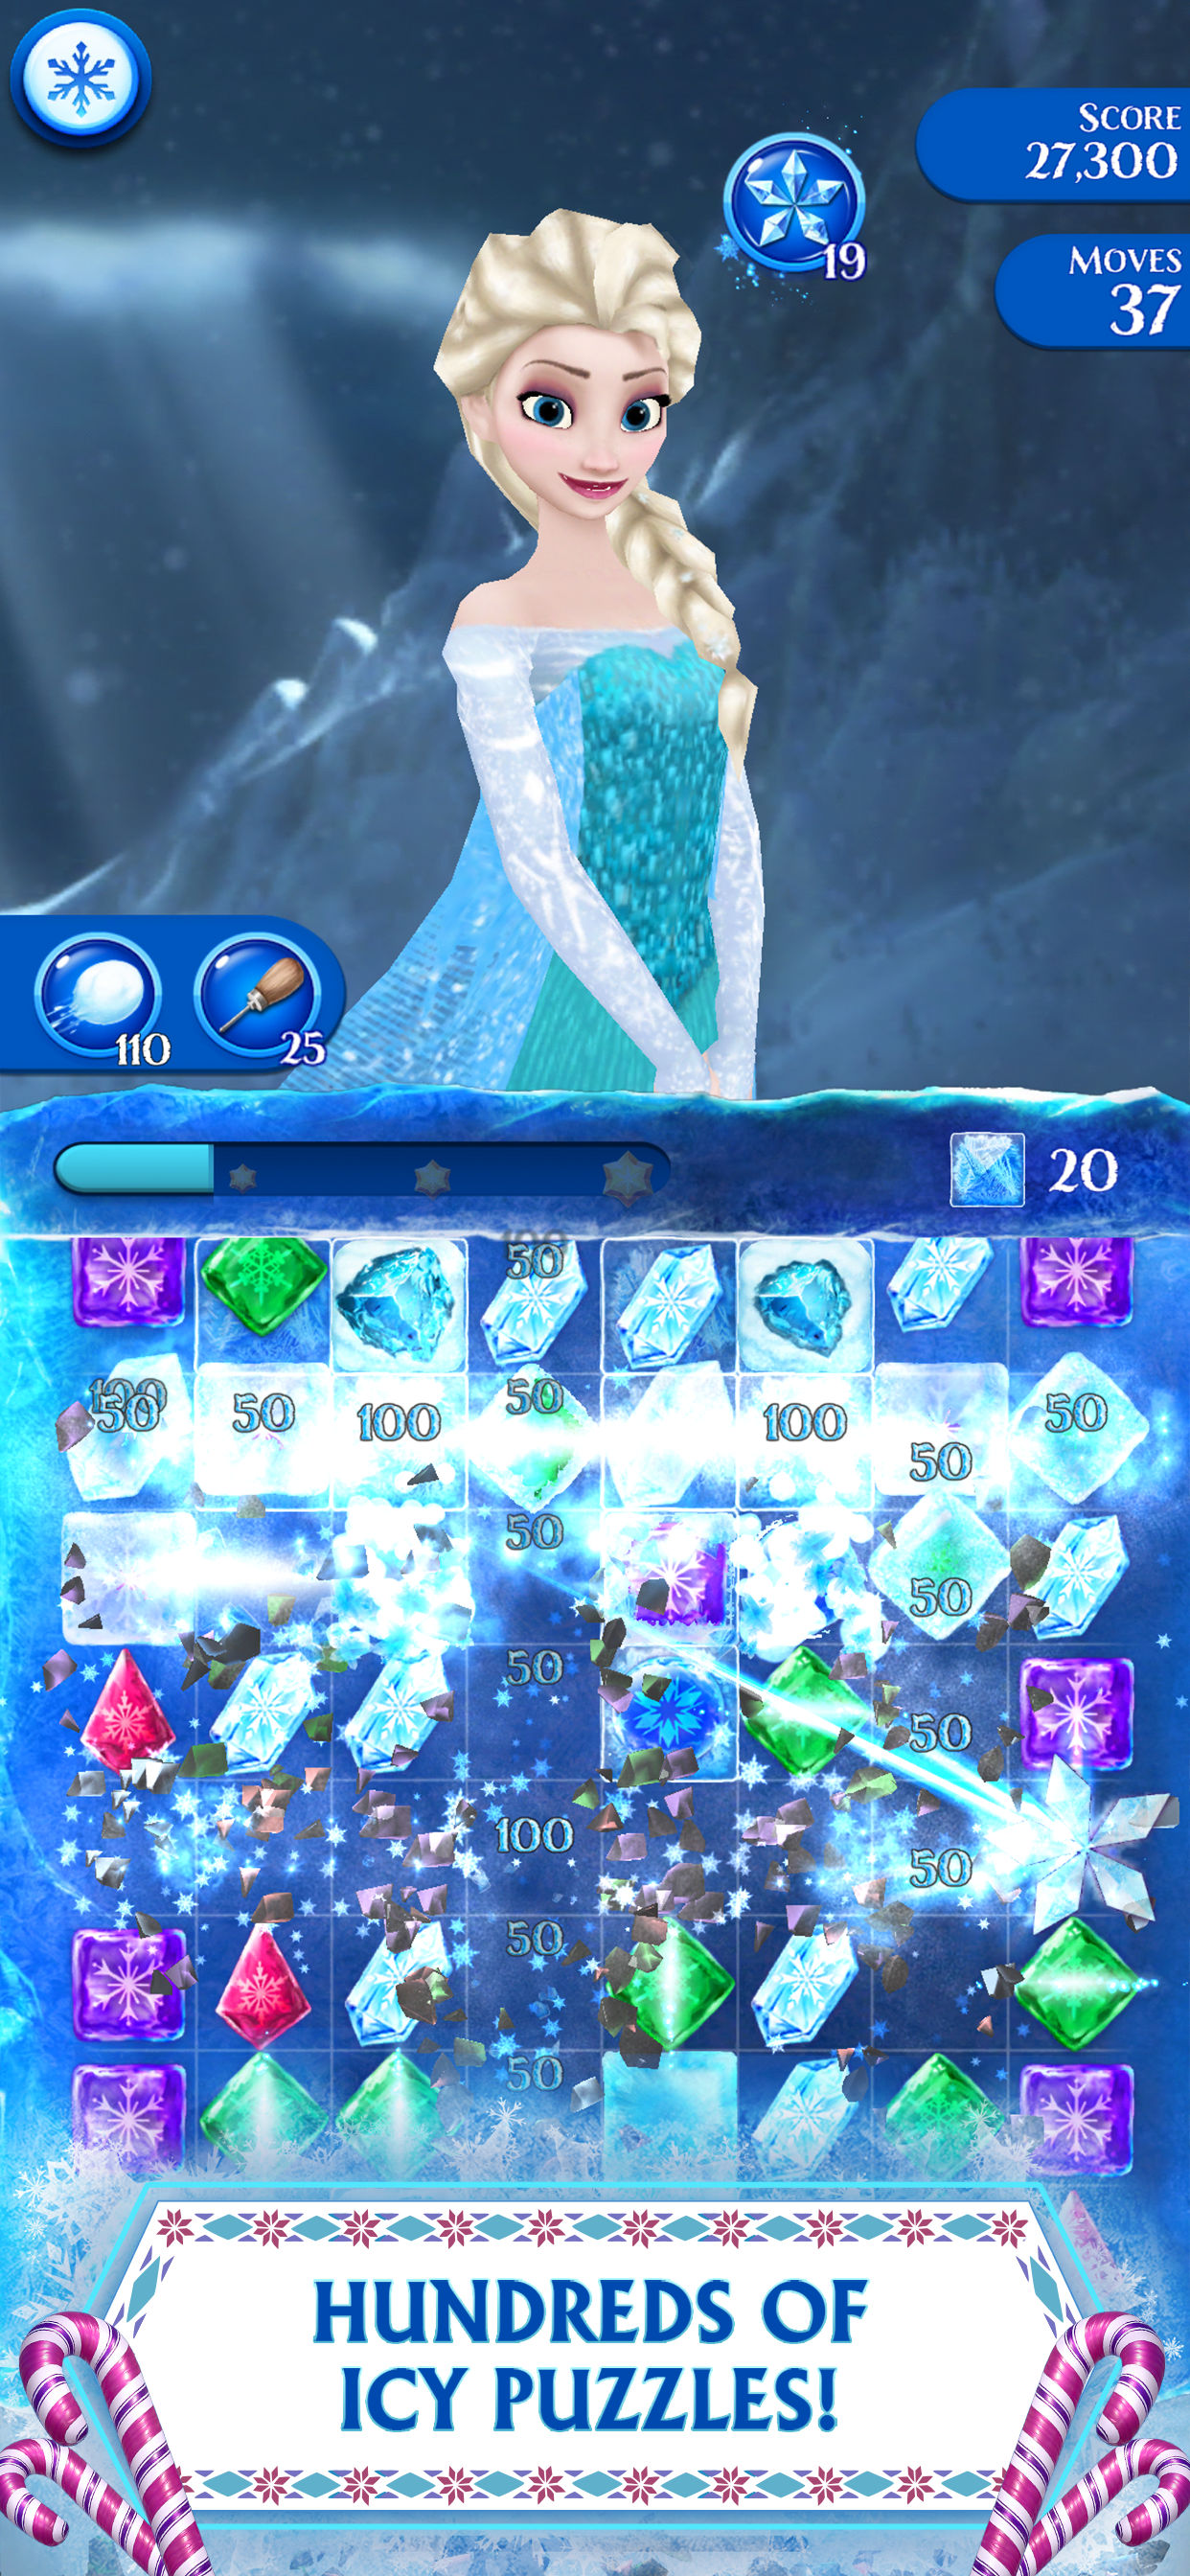 Frozen free fall hack cheats - free snowballs